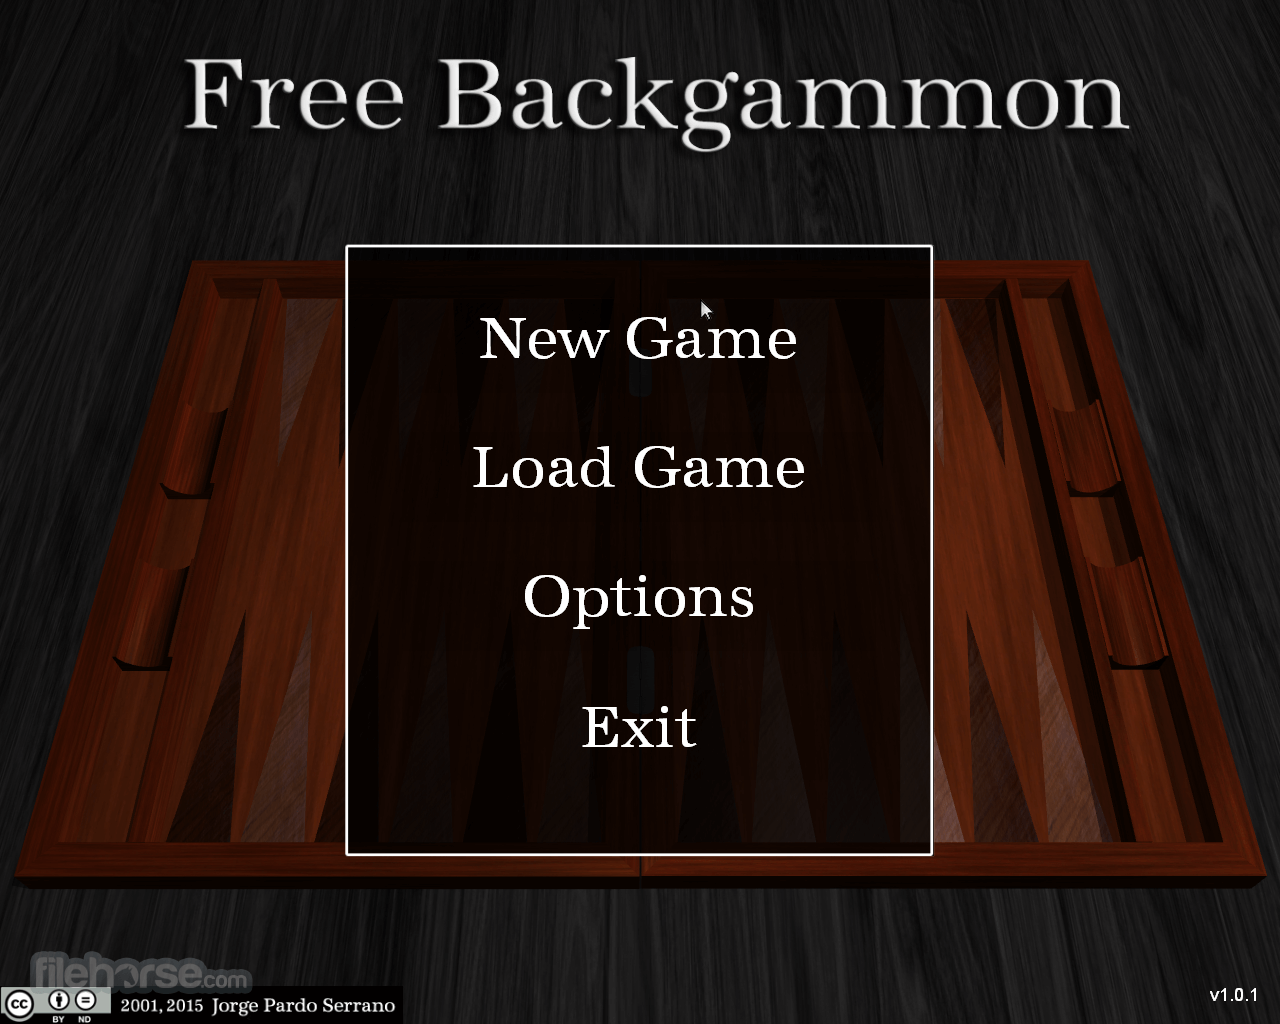 Free Backgammon 1.0.1 Screenshot 1